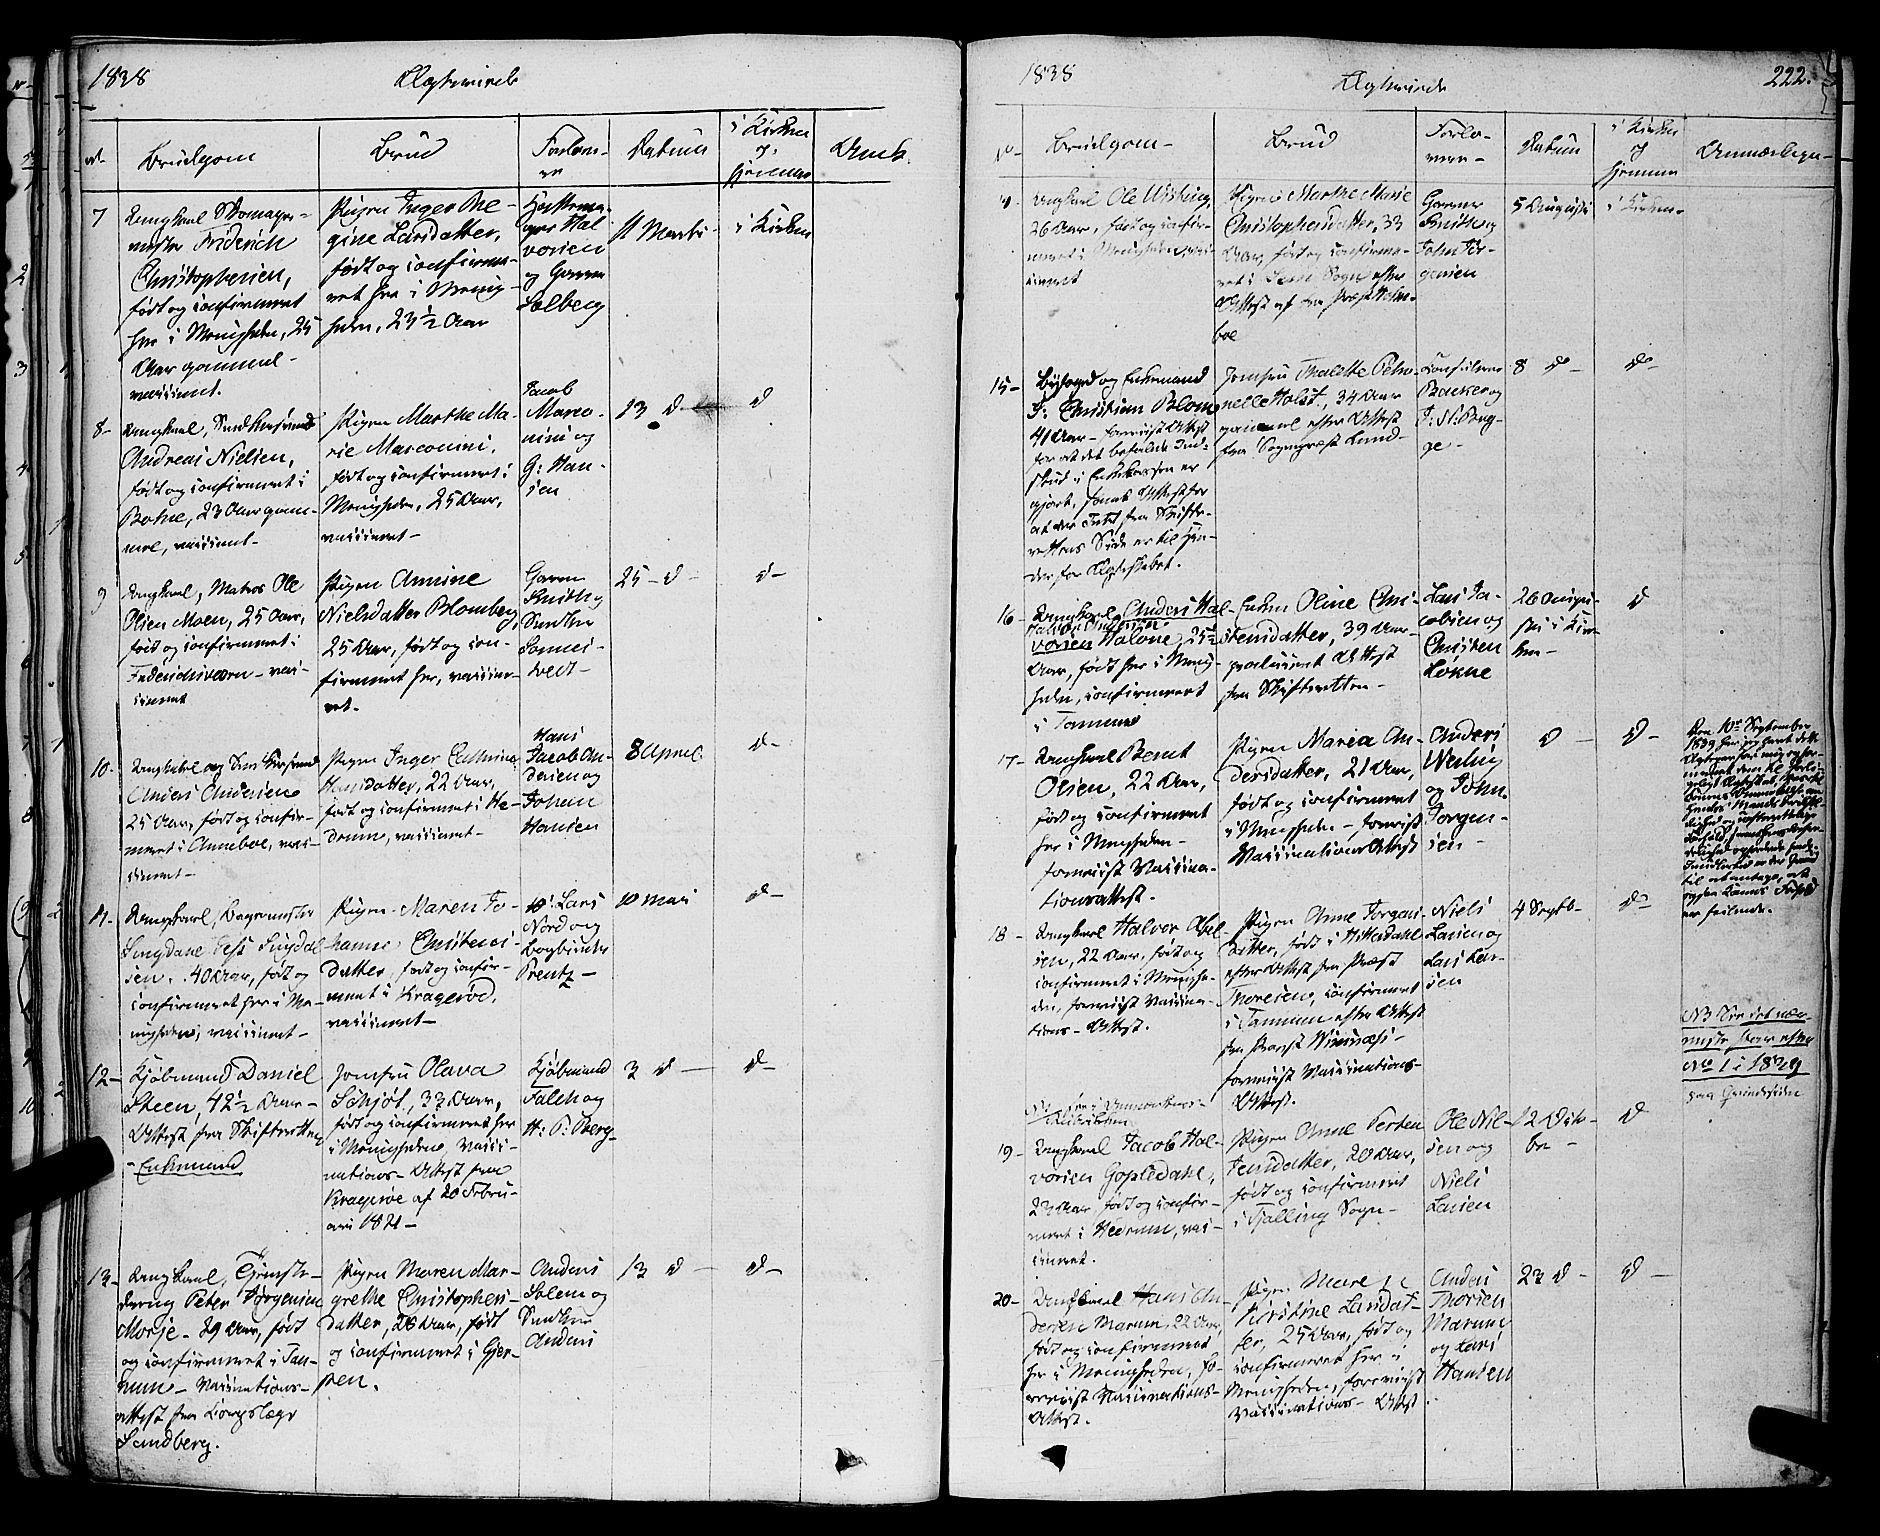 SAKO, Larvik kirkebøker, F/Fa/L0002: Ministerialbok nr. I 2, 1825-1847, s. 222